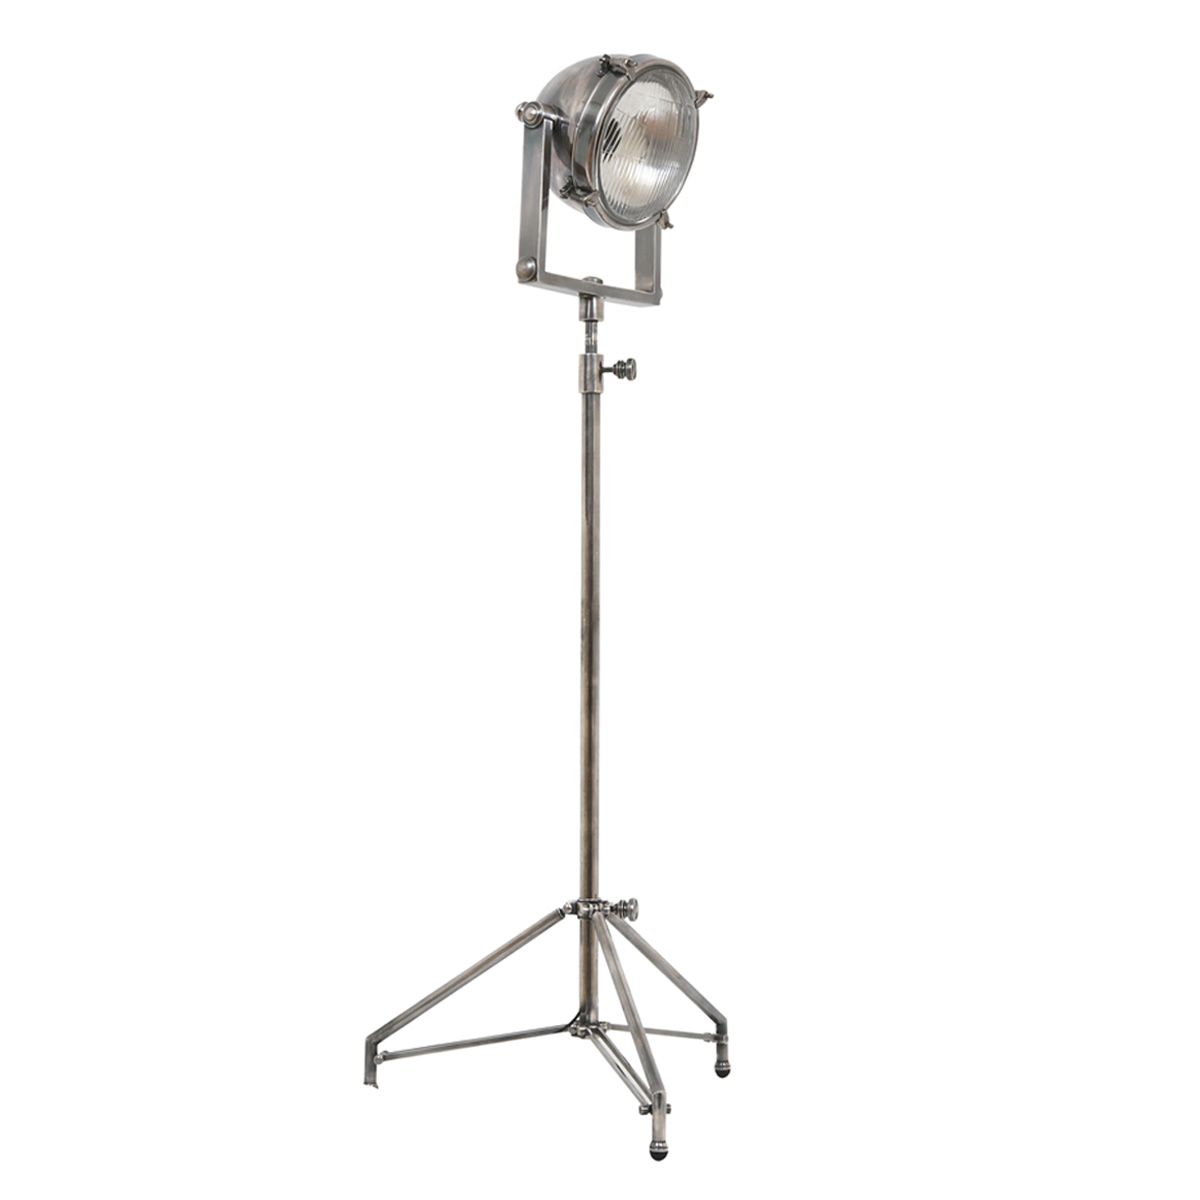 Industrielle Vintage Stehlampe Austin